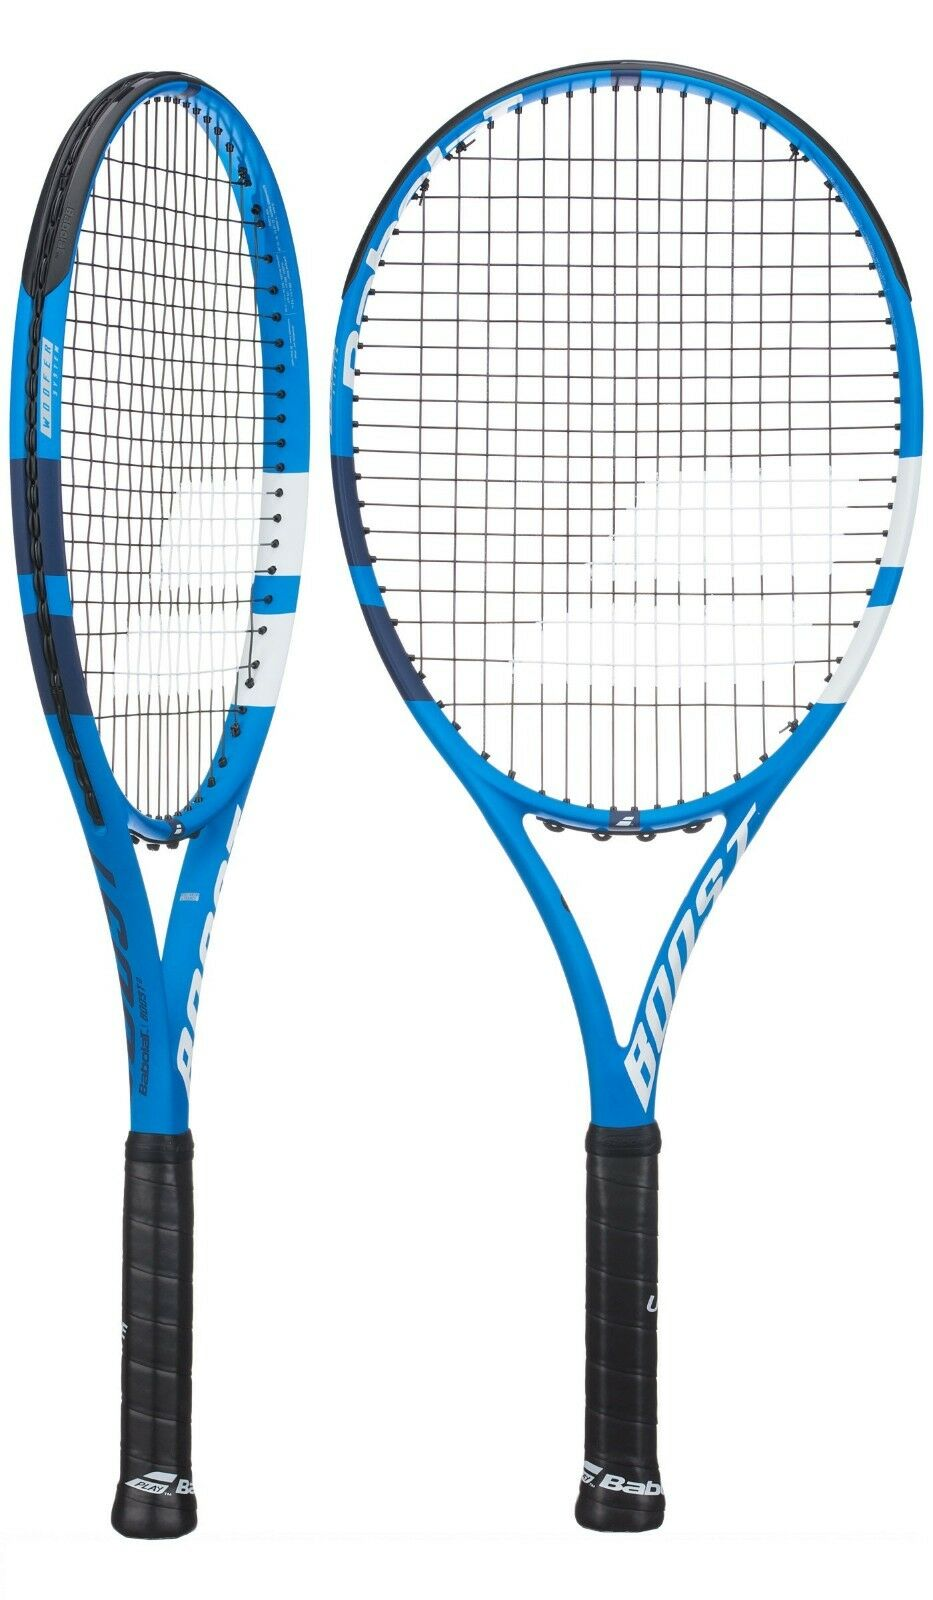 Nuevo  2018 Babolat Boost  D  tenis raqueta (elija Agarre Cubierta Completa) prestrung.